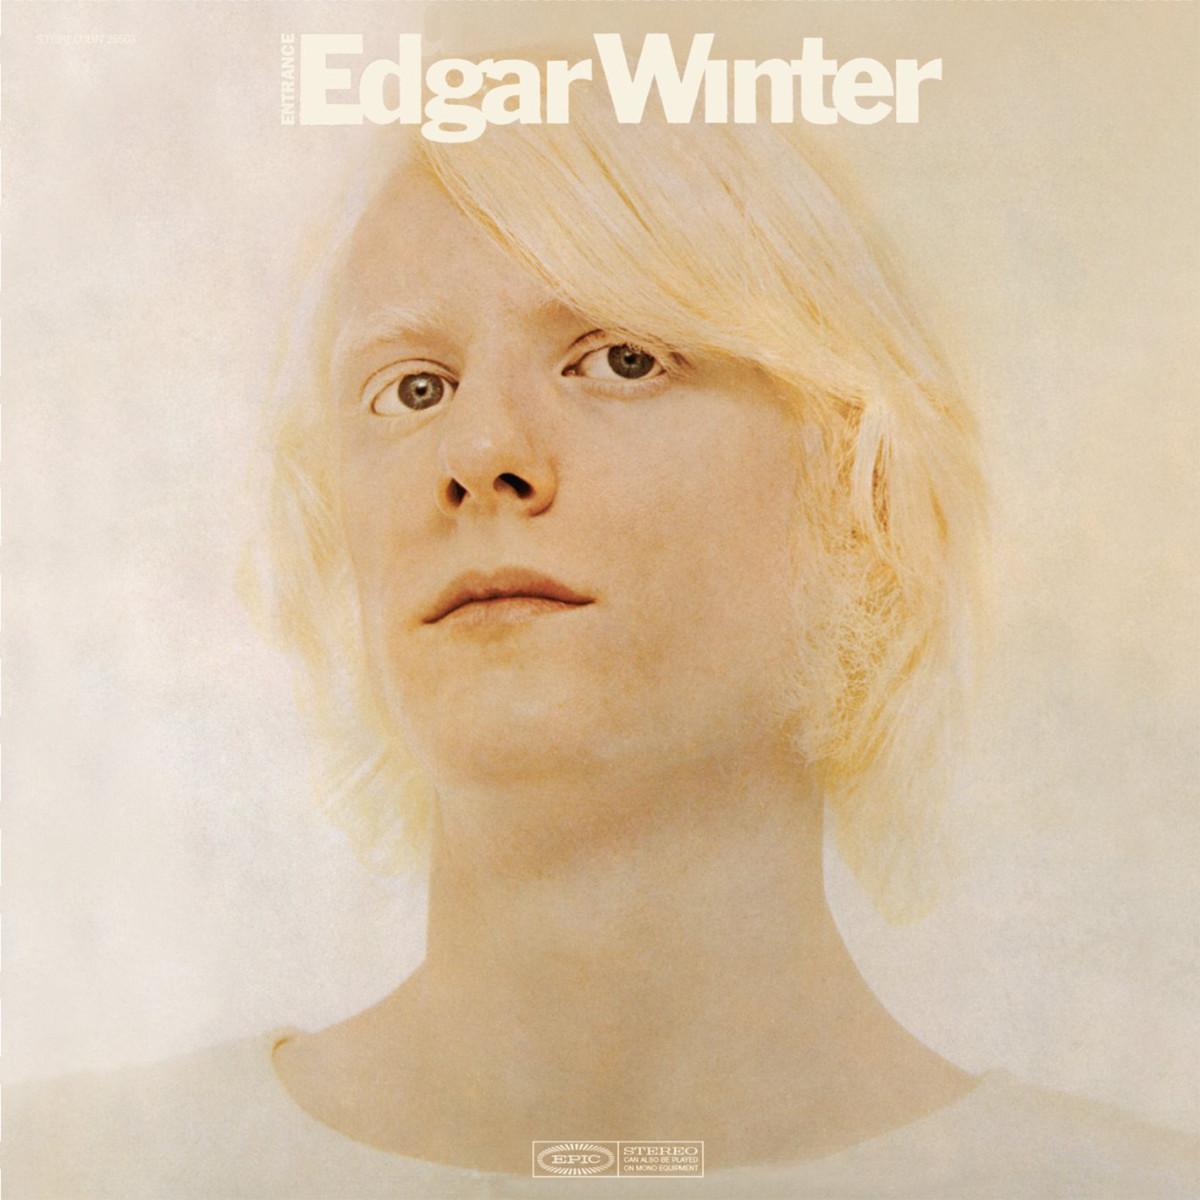 Edgar Winter Entrance